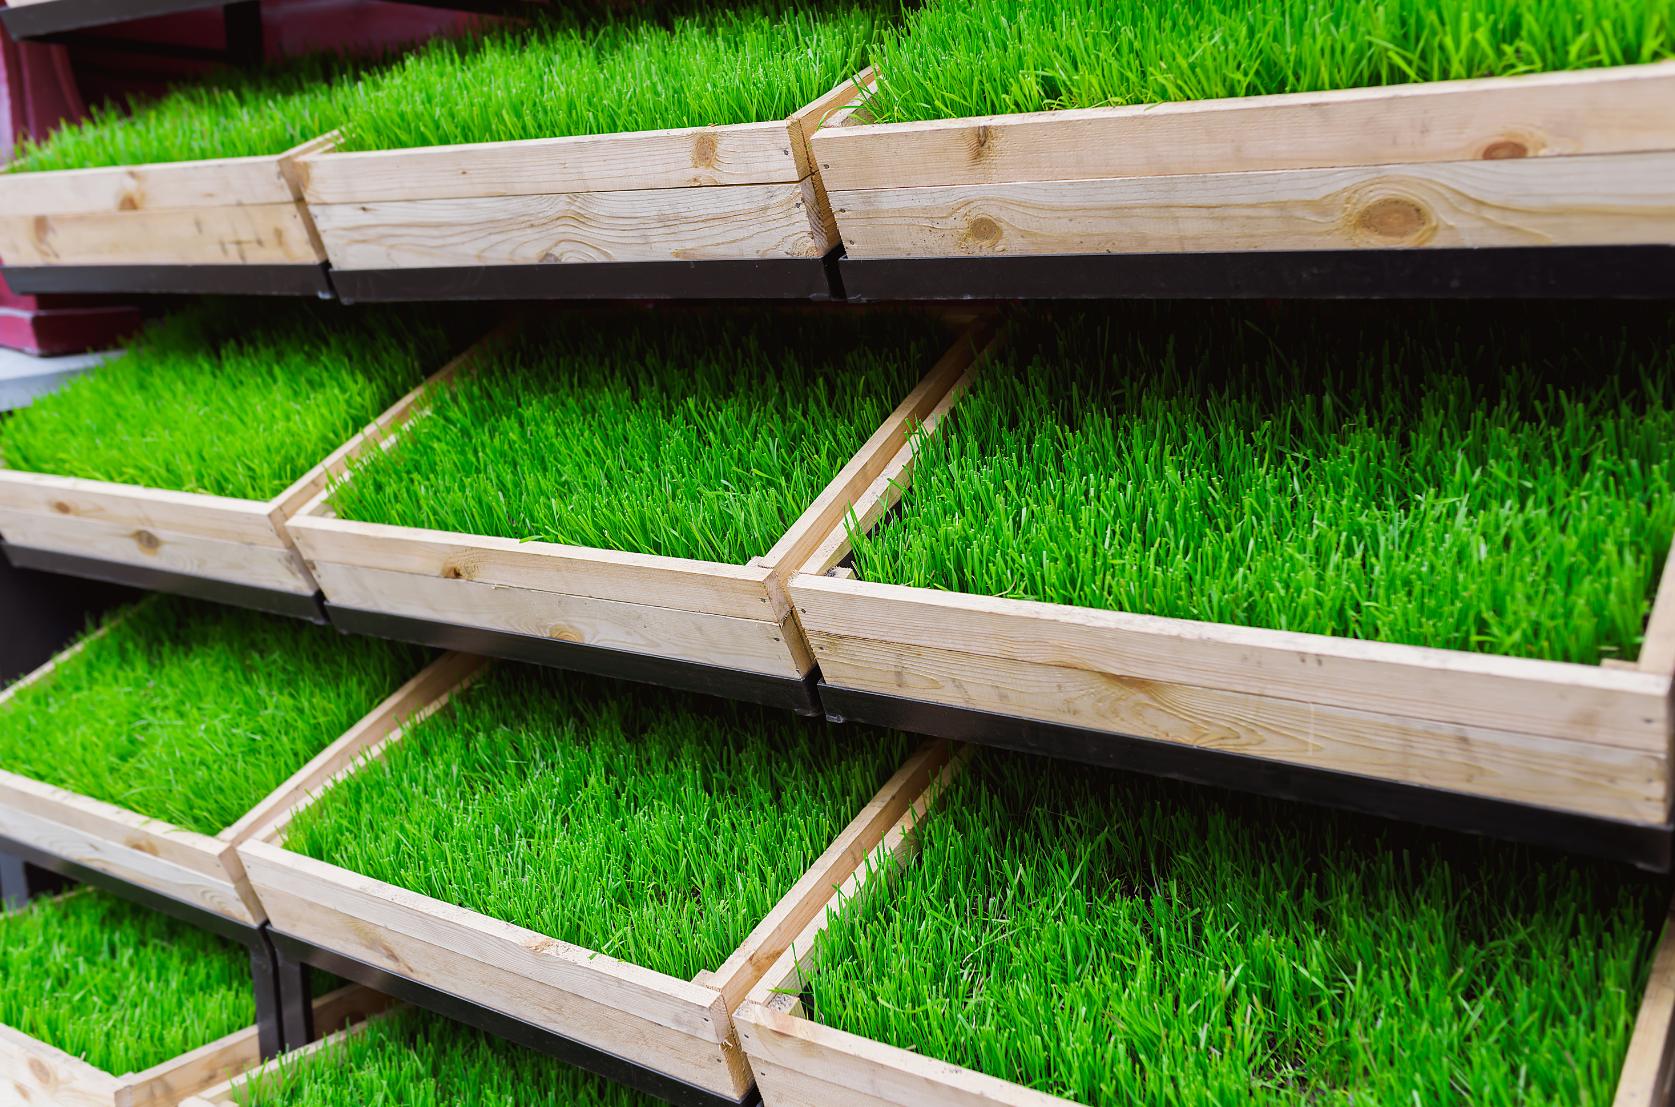 Natural Grass Pads in Wooden Frames